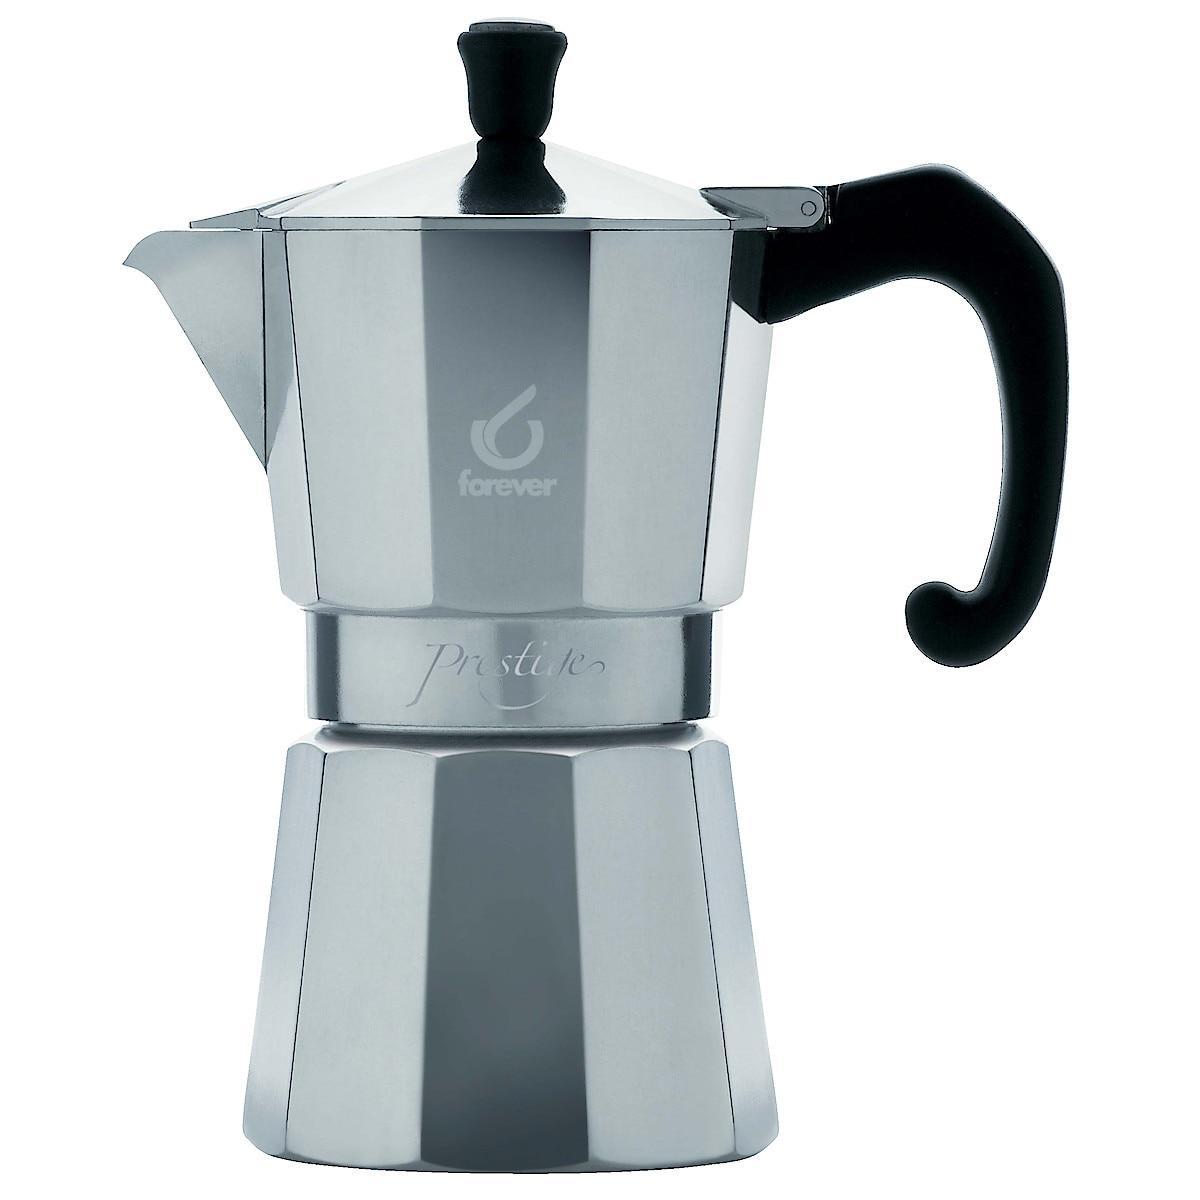 Prestige espressokoker